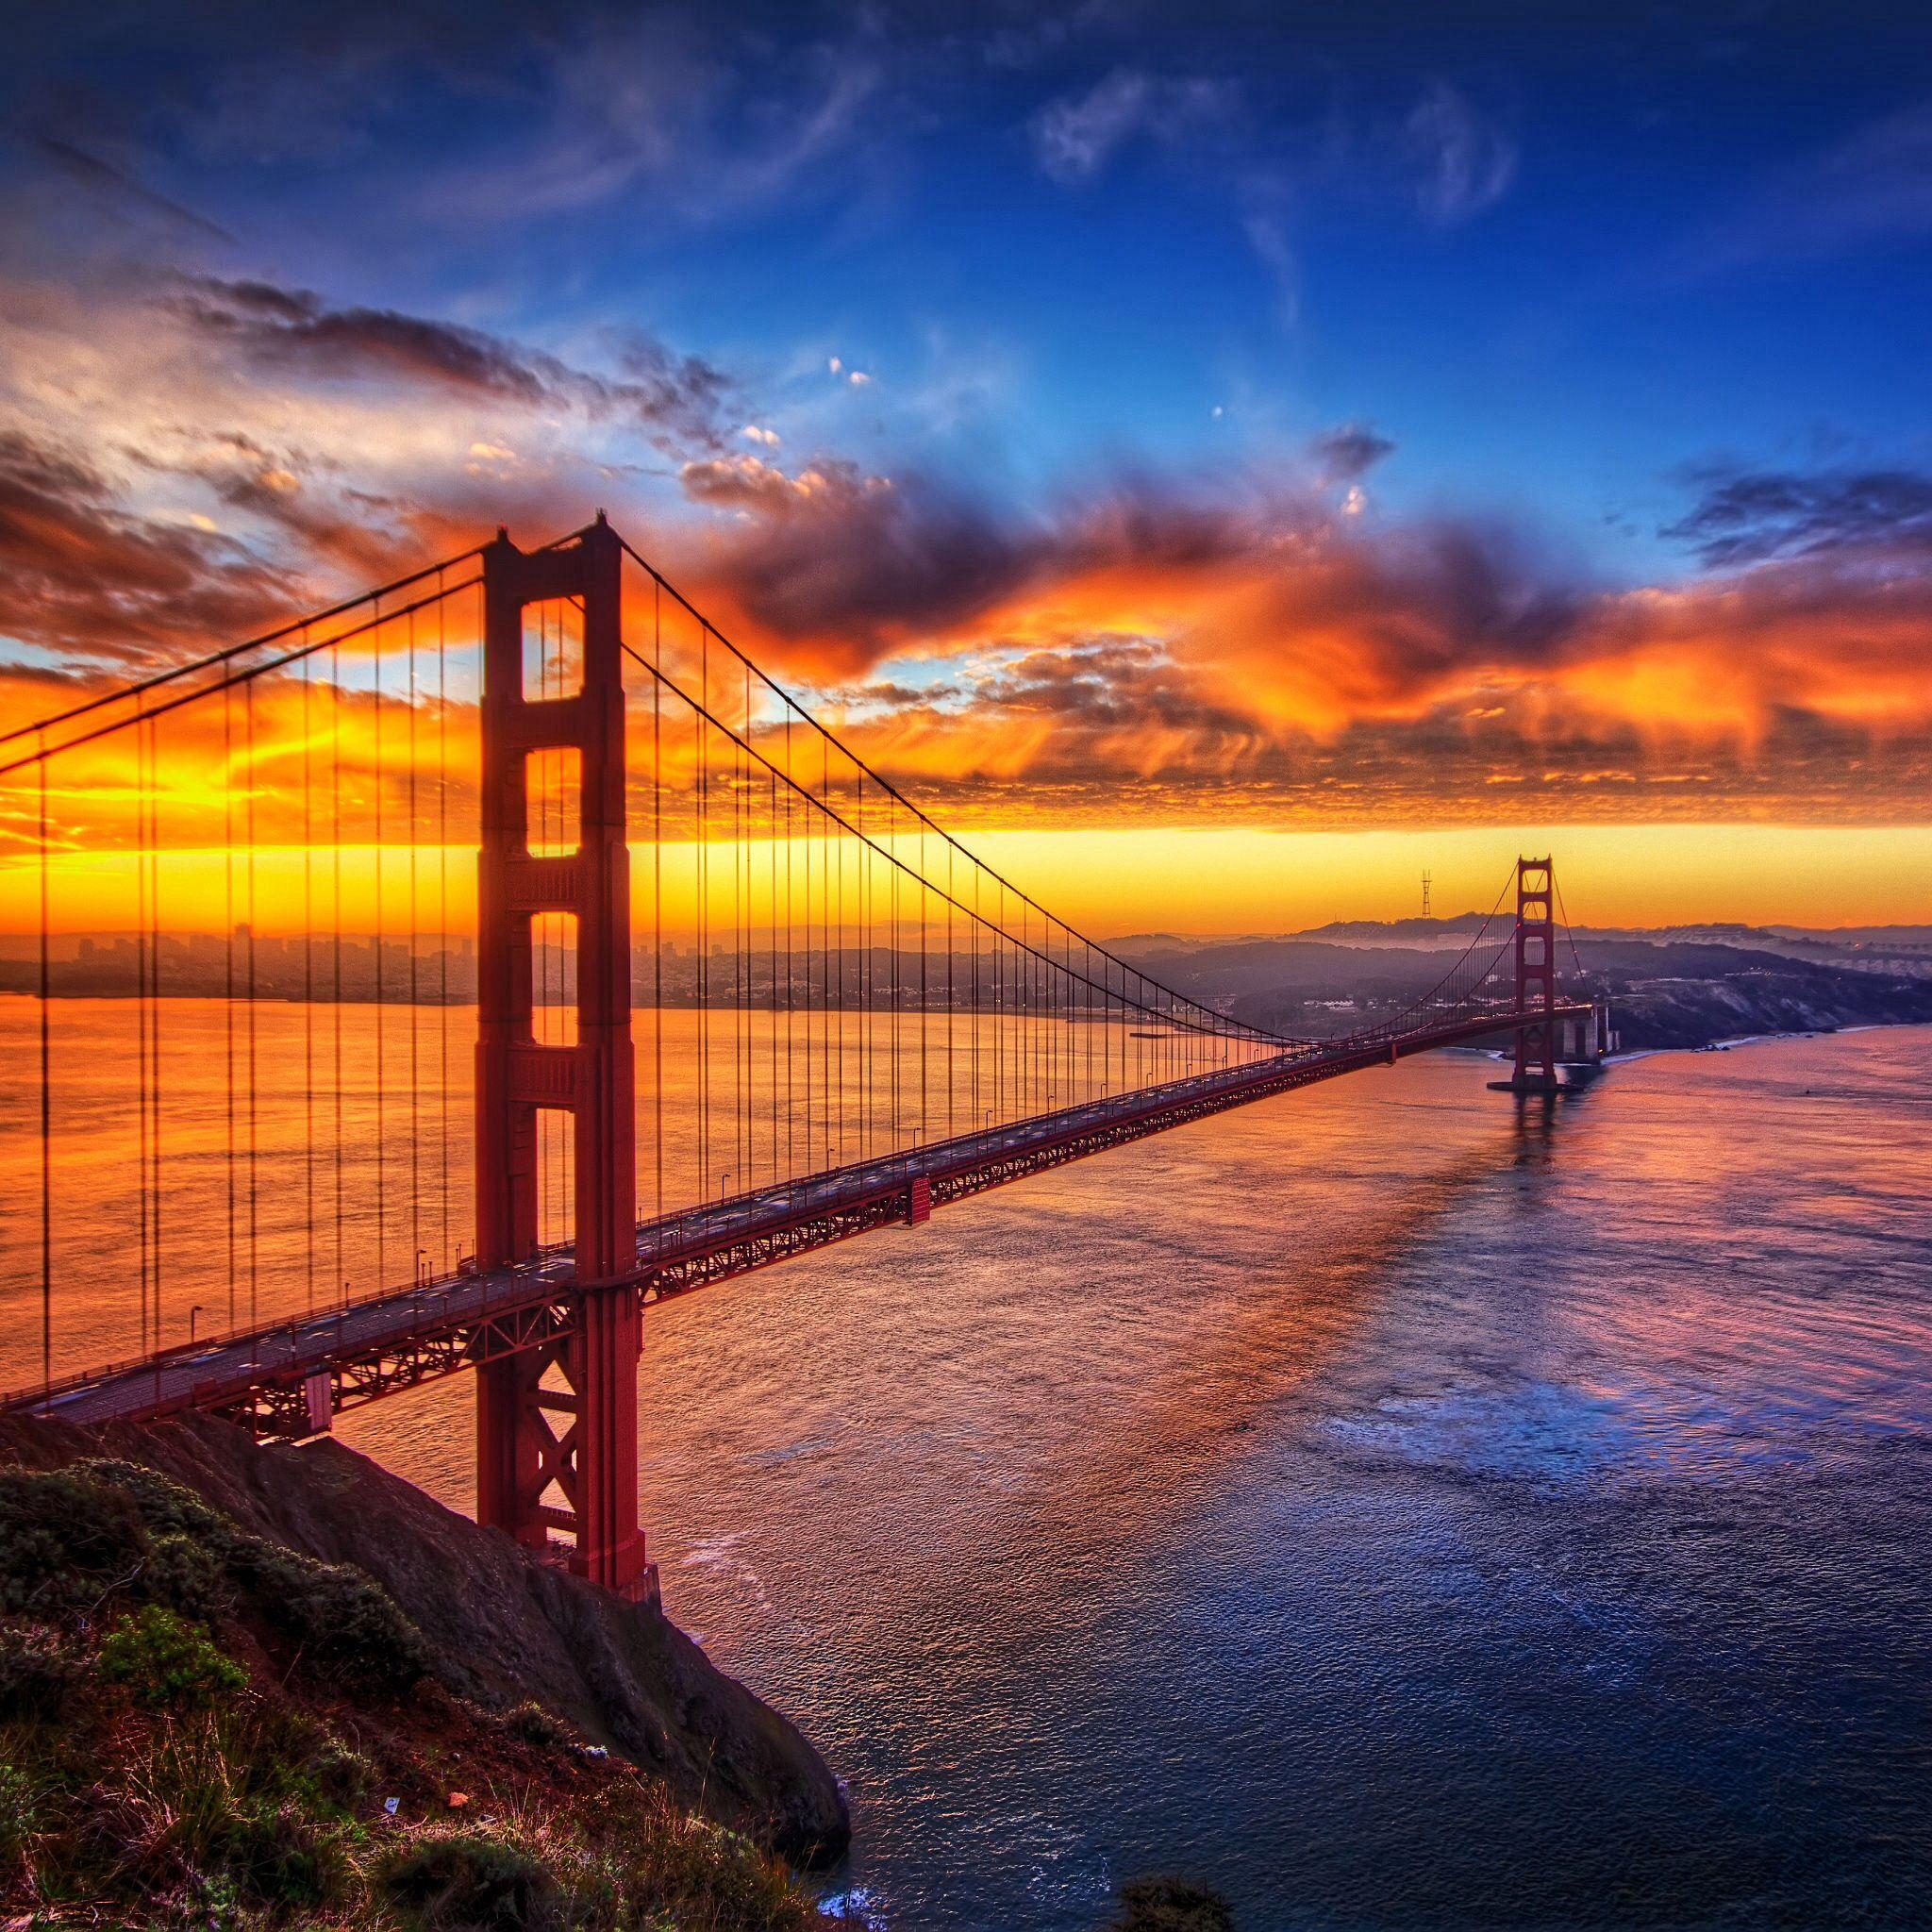 Sunset behind bridge photo